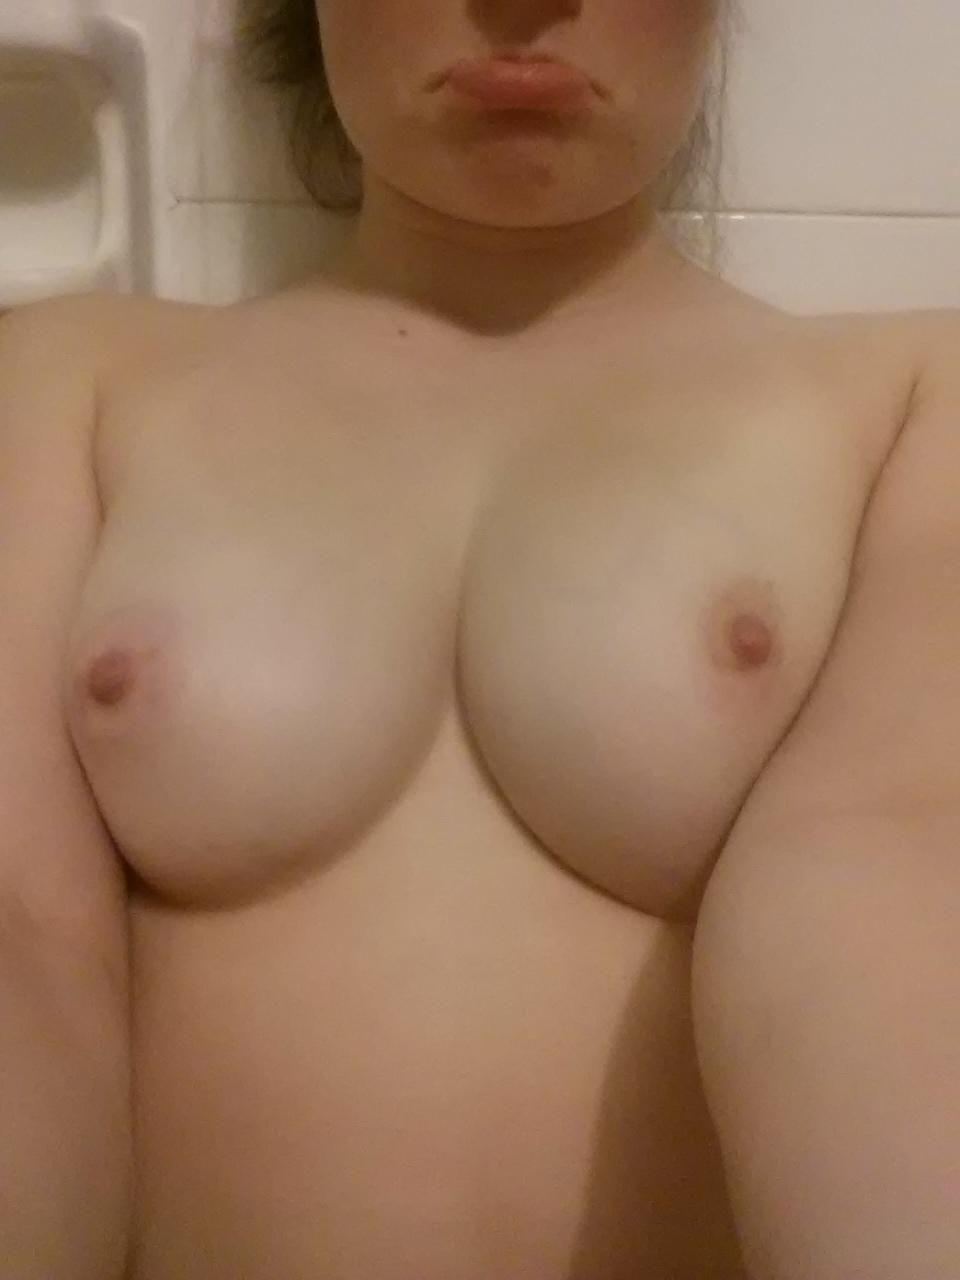 http://i5.imageban.ru/out/2014/09/04/4111a4c39a726b4e9ce7c2219b141dec.jpg